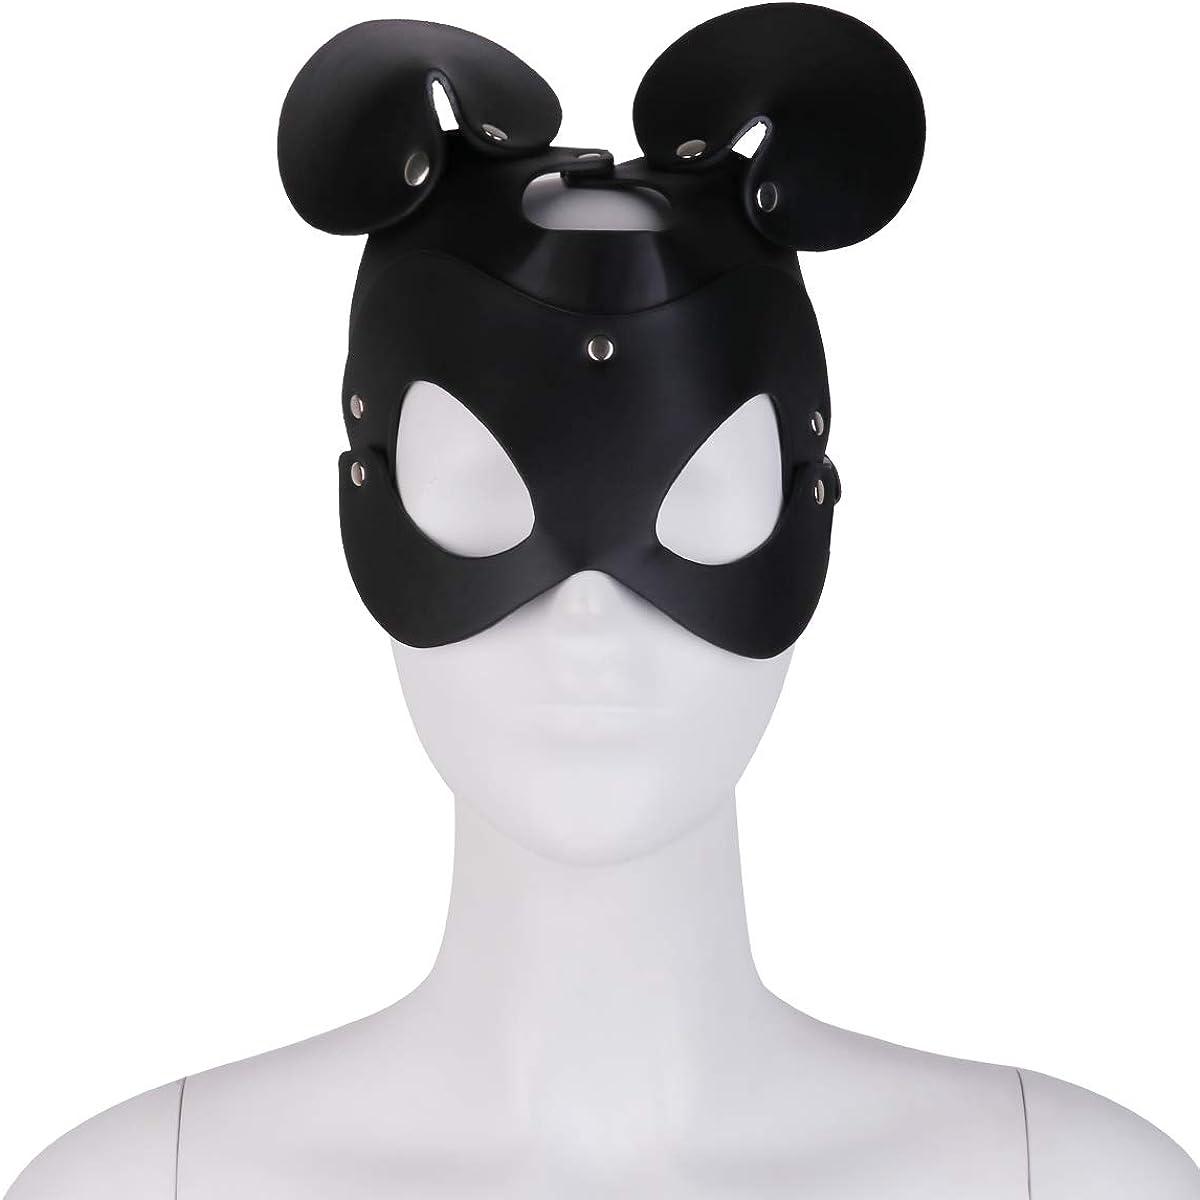 Freebily Maschera Orecchie Coniglio e Topolino in Pelle PU Mascherna Meta Faccia Cuoio Maschera Carnevale Veneziana Nera Mashere Horror Halloween Masquerade Mask